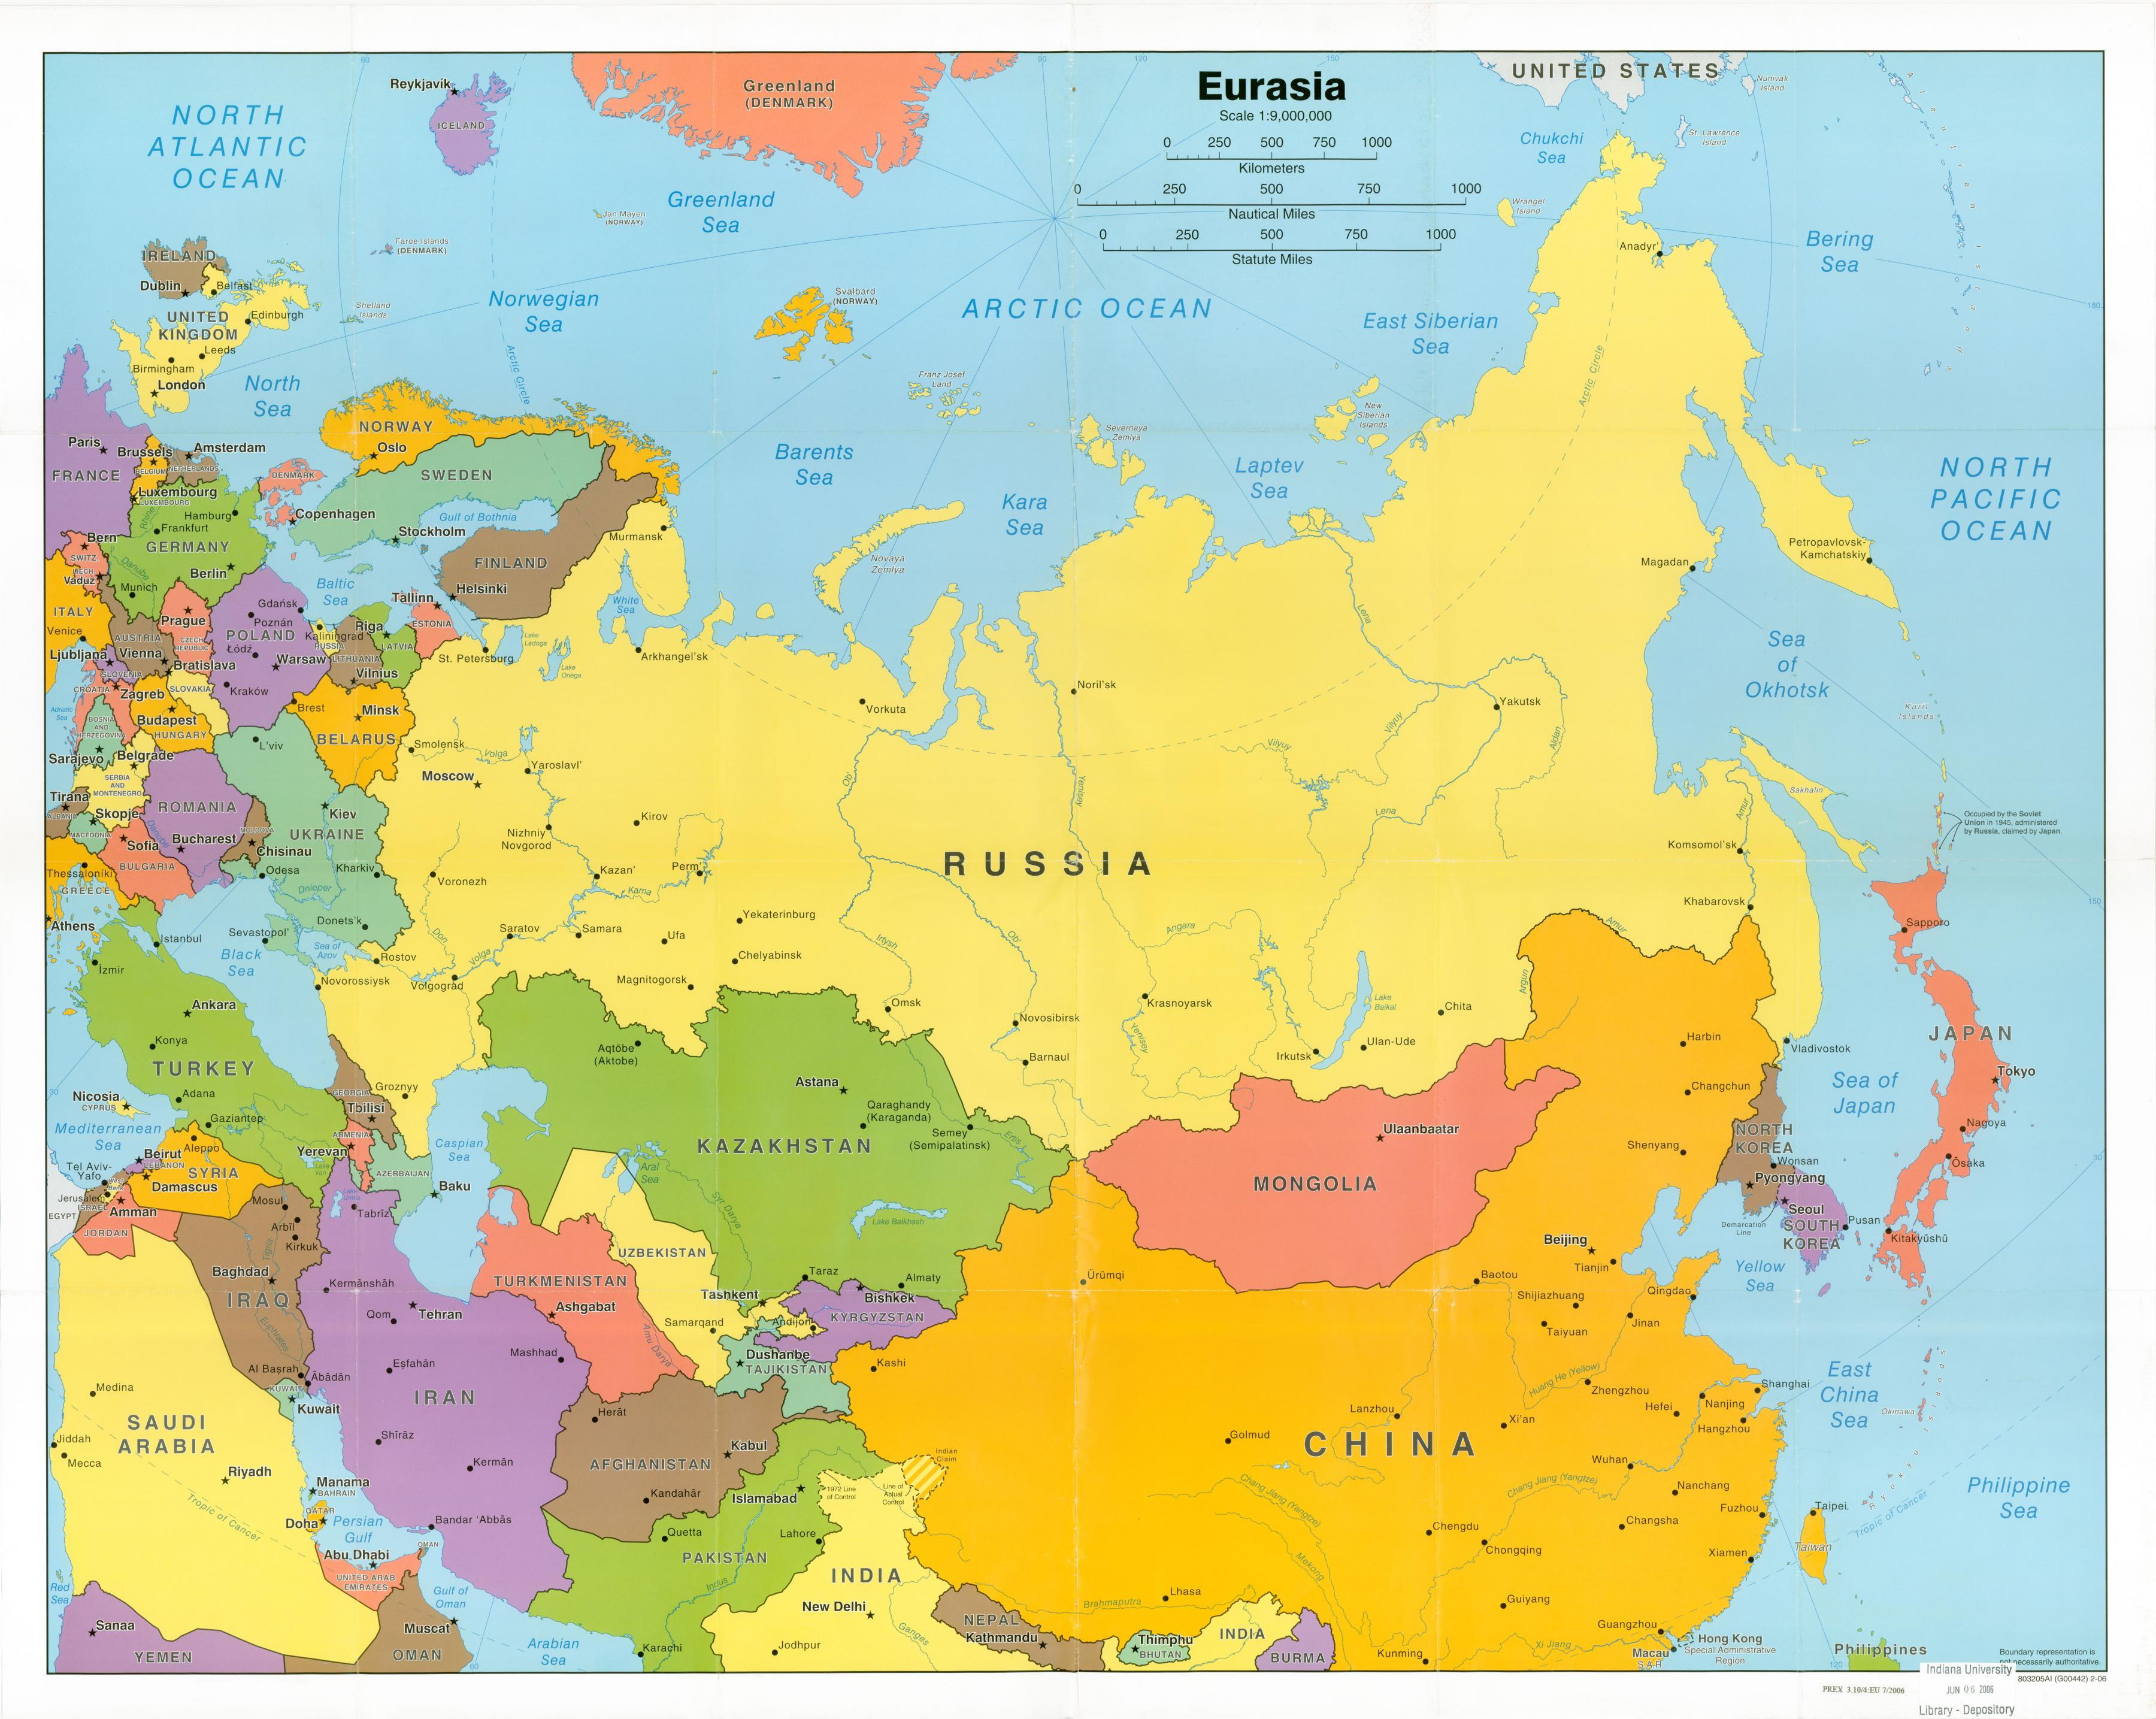 Cartina Urss.Vs Urss Russia Mappa Mappa Dell Urss Vs Russia Europa Dell Est Europa